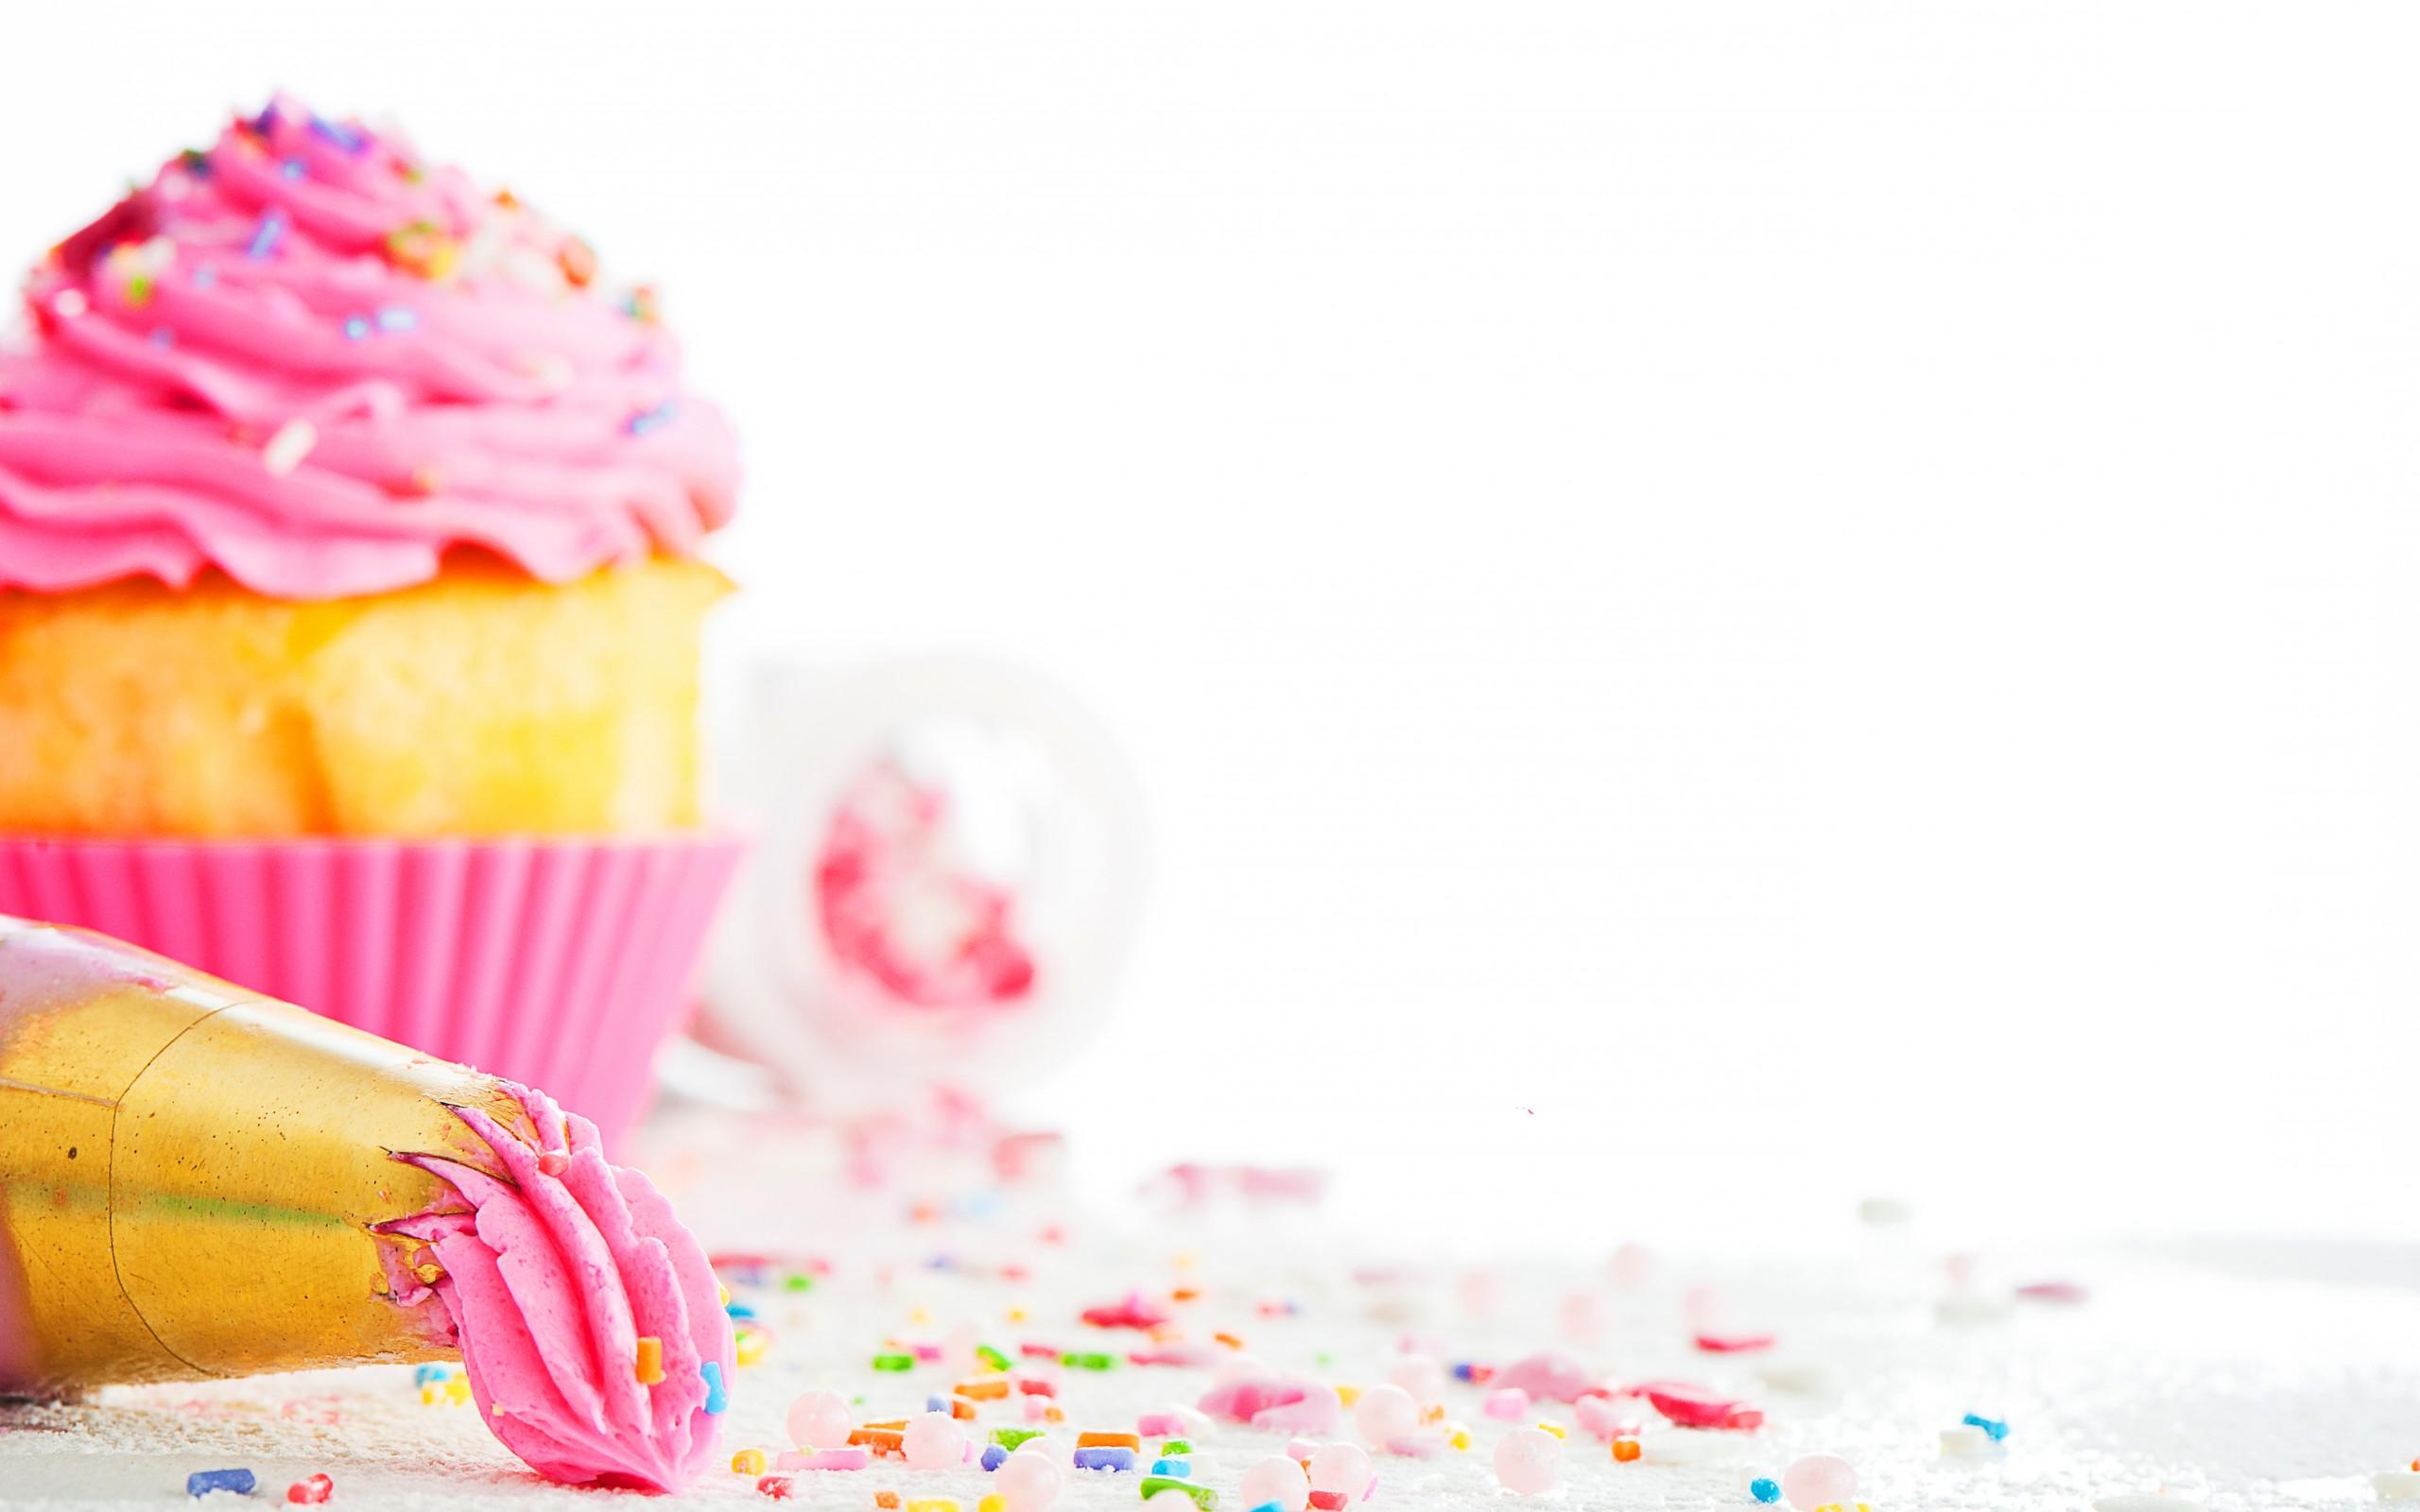 cupcakes wallpaper iphone